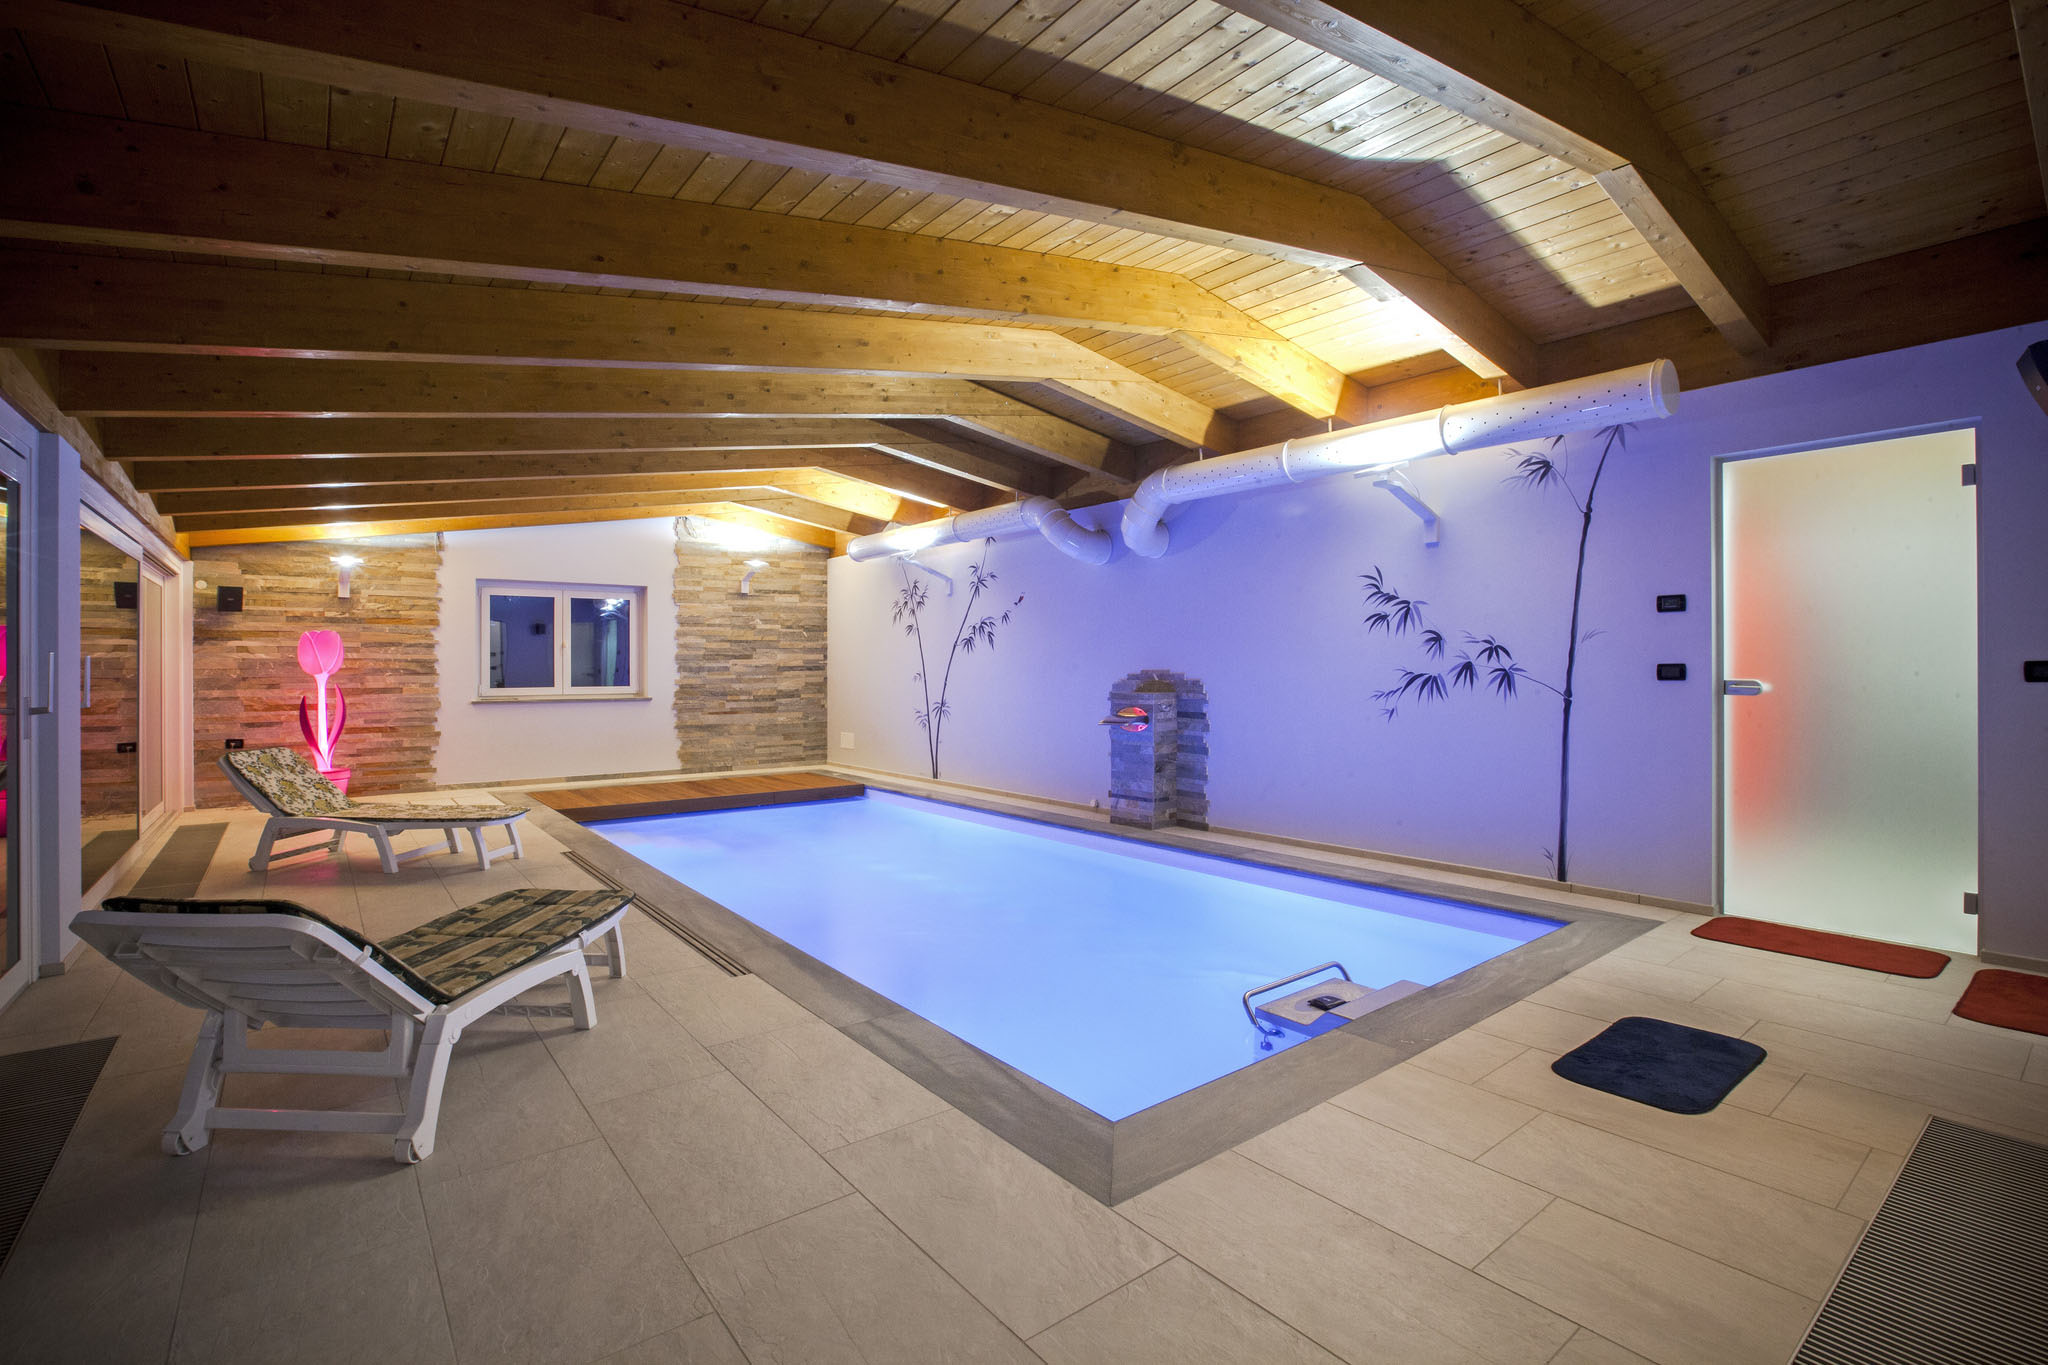 Endless Pool | Paradise Design Pool And Spa | St George UT